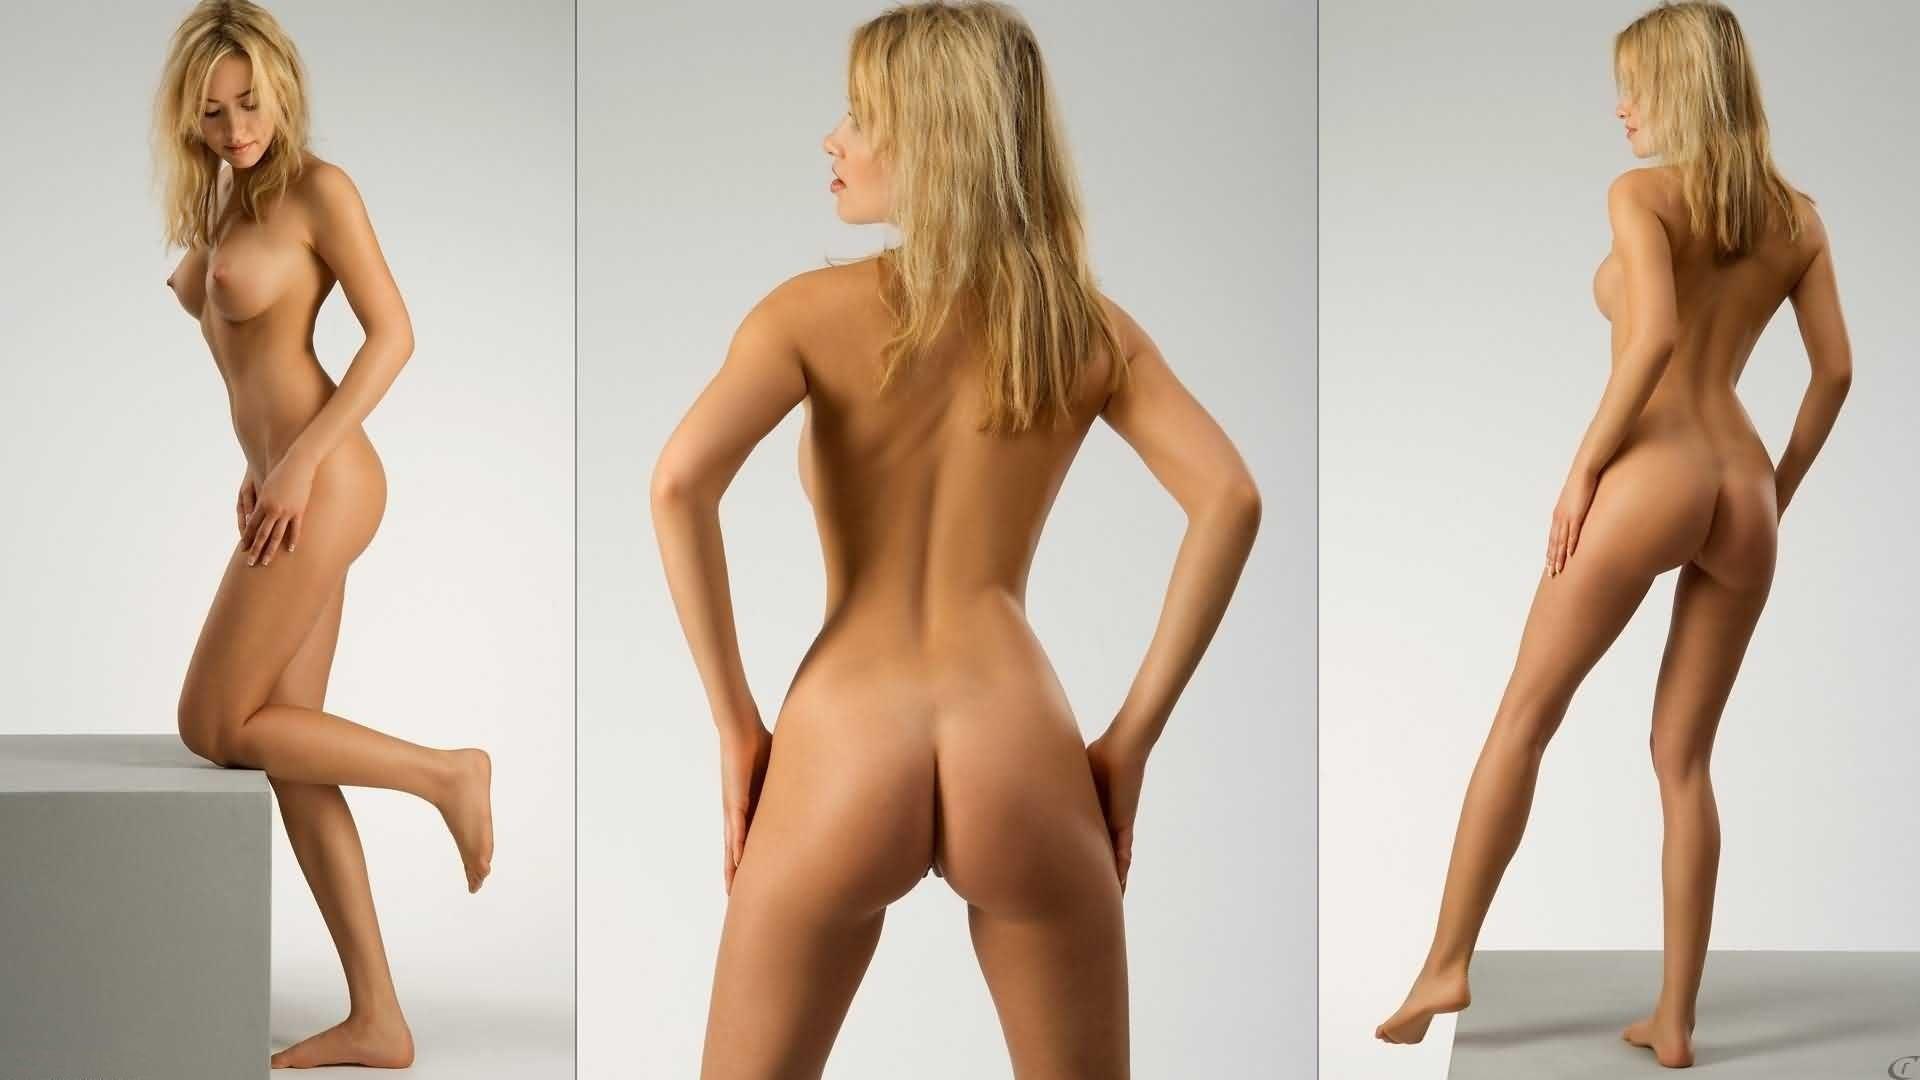 Nude Model Screensavers 108